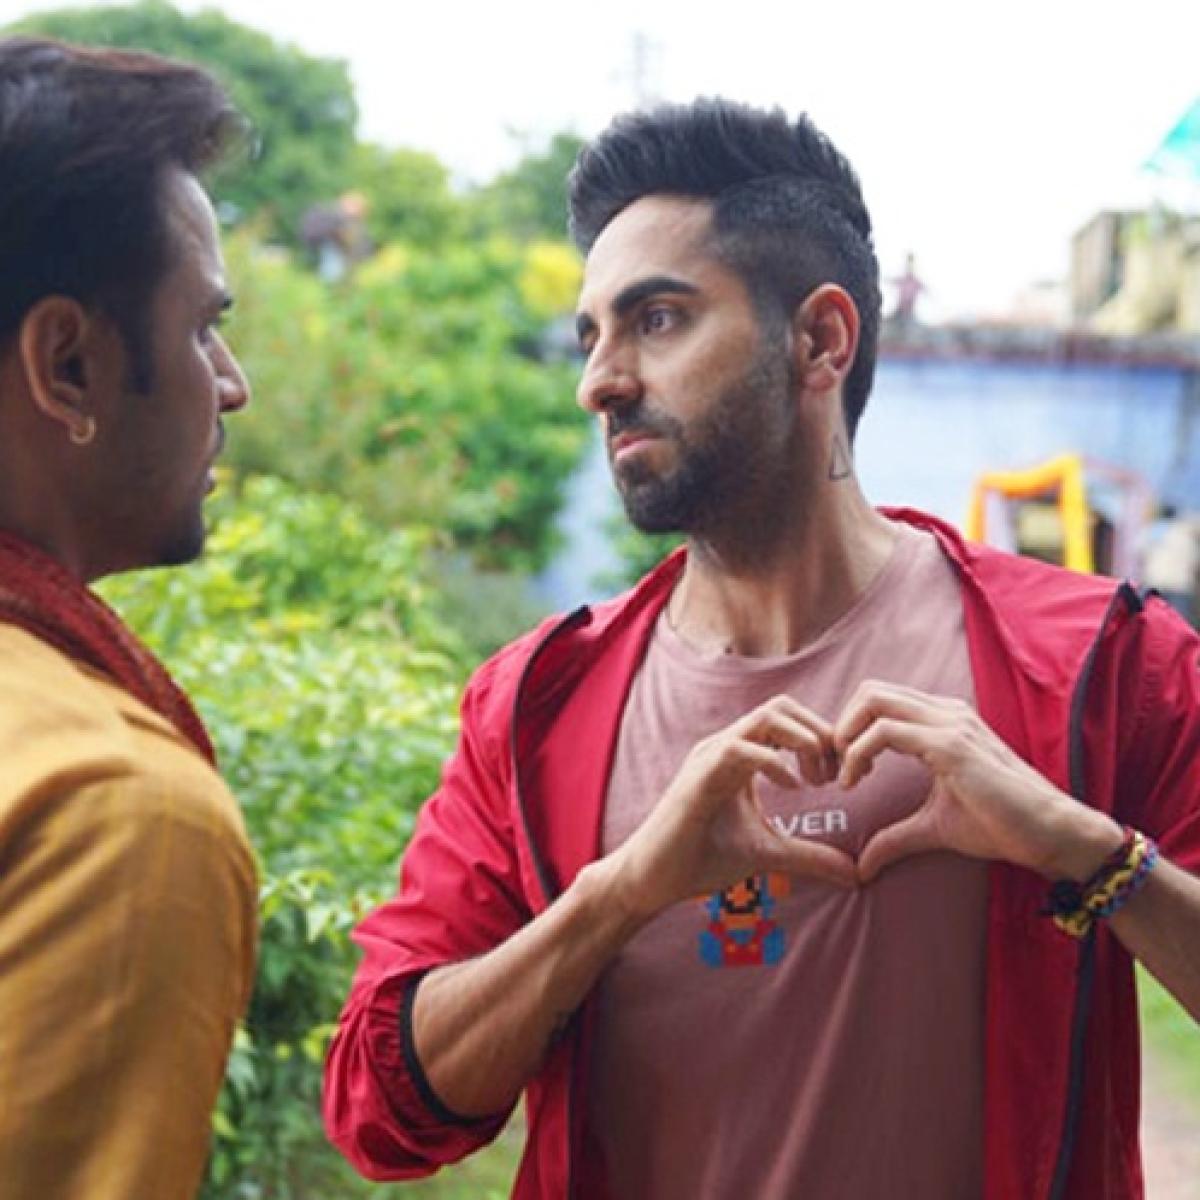 Shubh Mangal Zyada Saavdhan: Ayushmann Khurrana's flick based on same-sex relationship banned in UAE